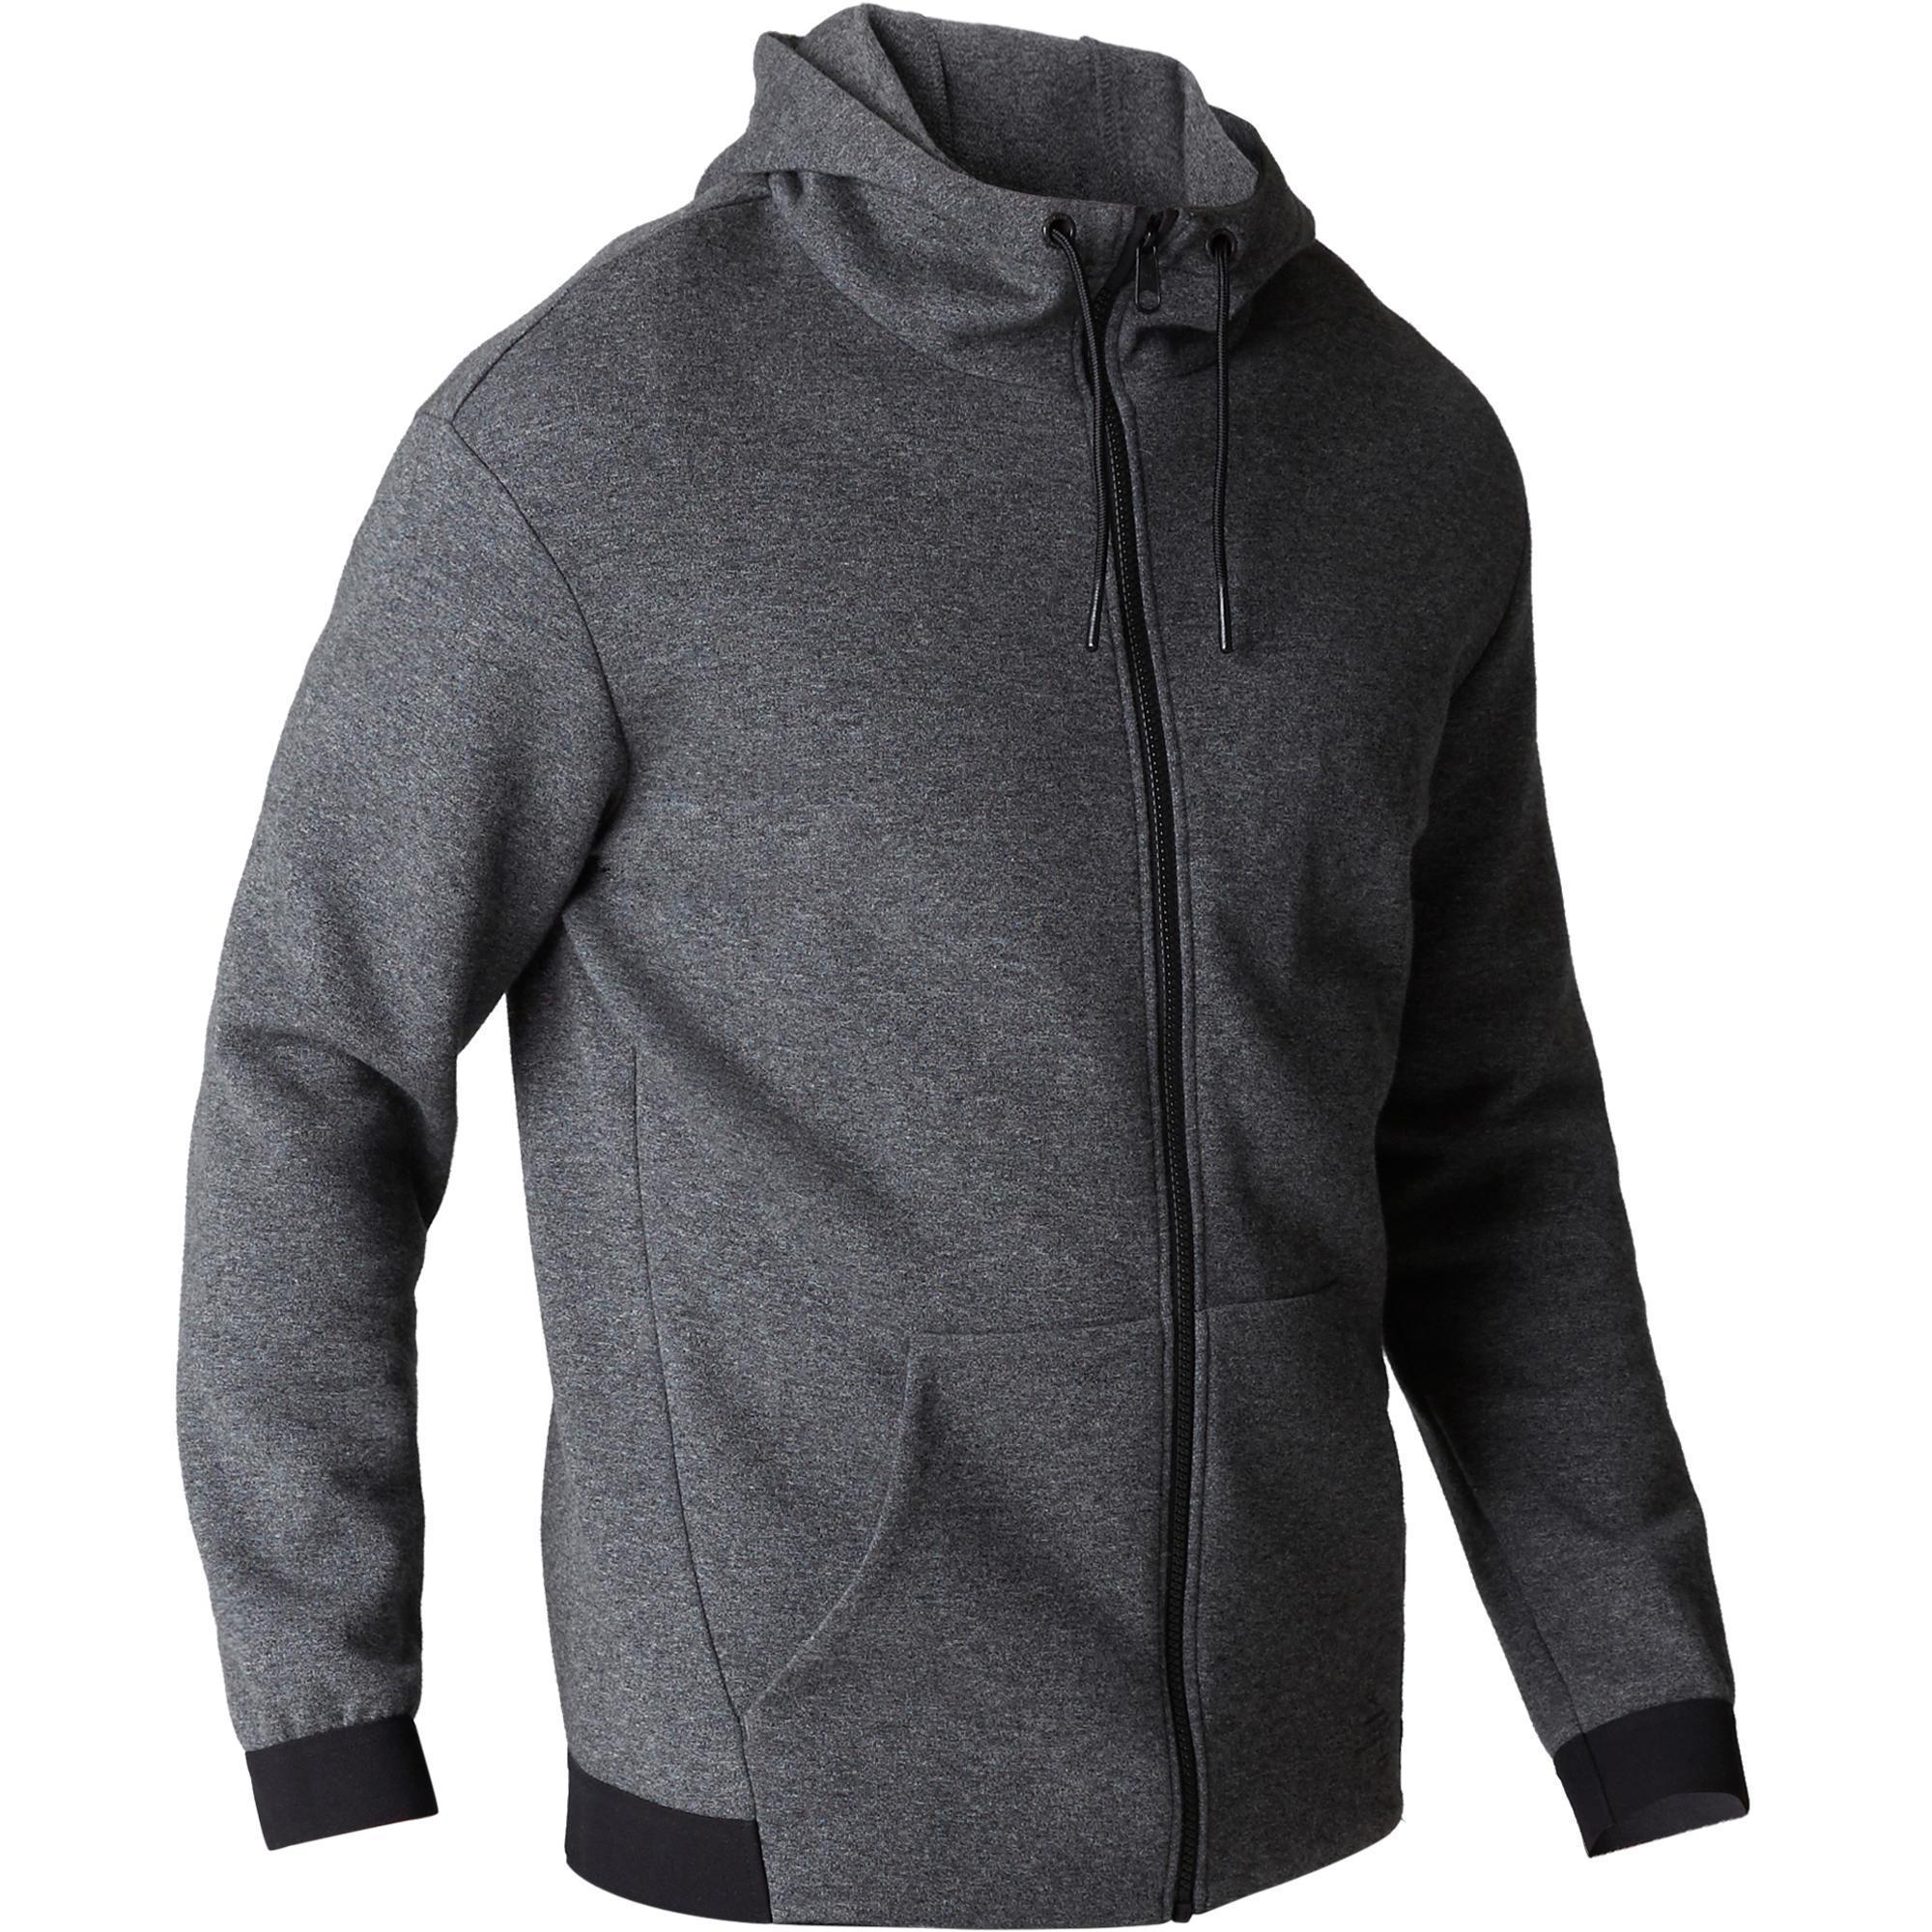 65b6ab6e6b55 560 Hooded Gentle Gym & Pilates Jacket - Mottled Dark Grey - Decathlon